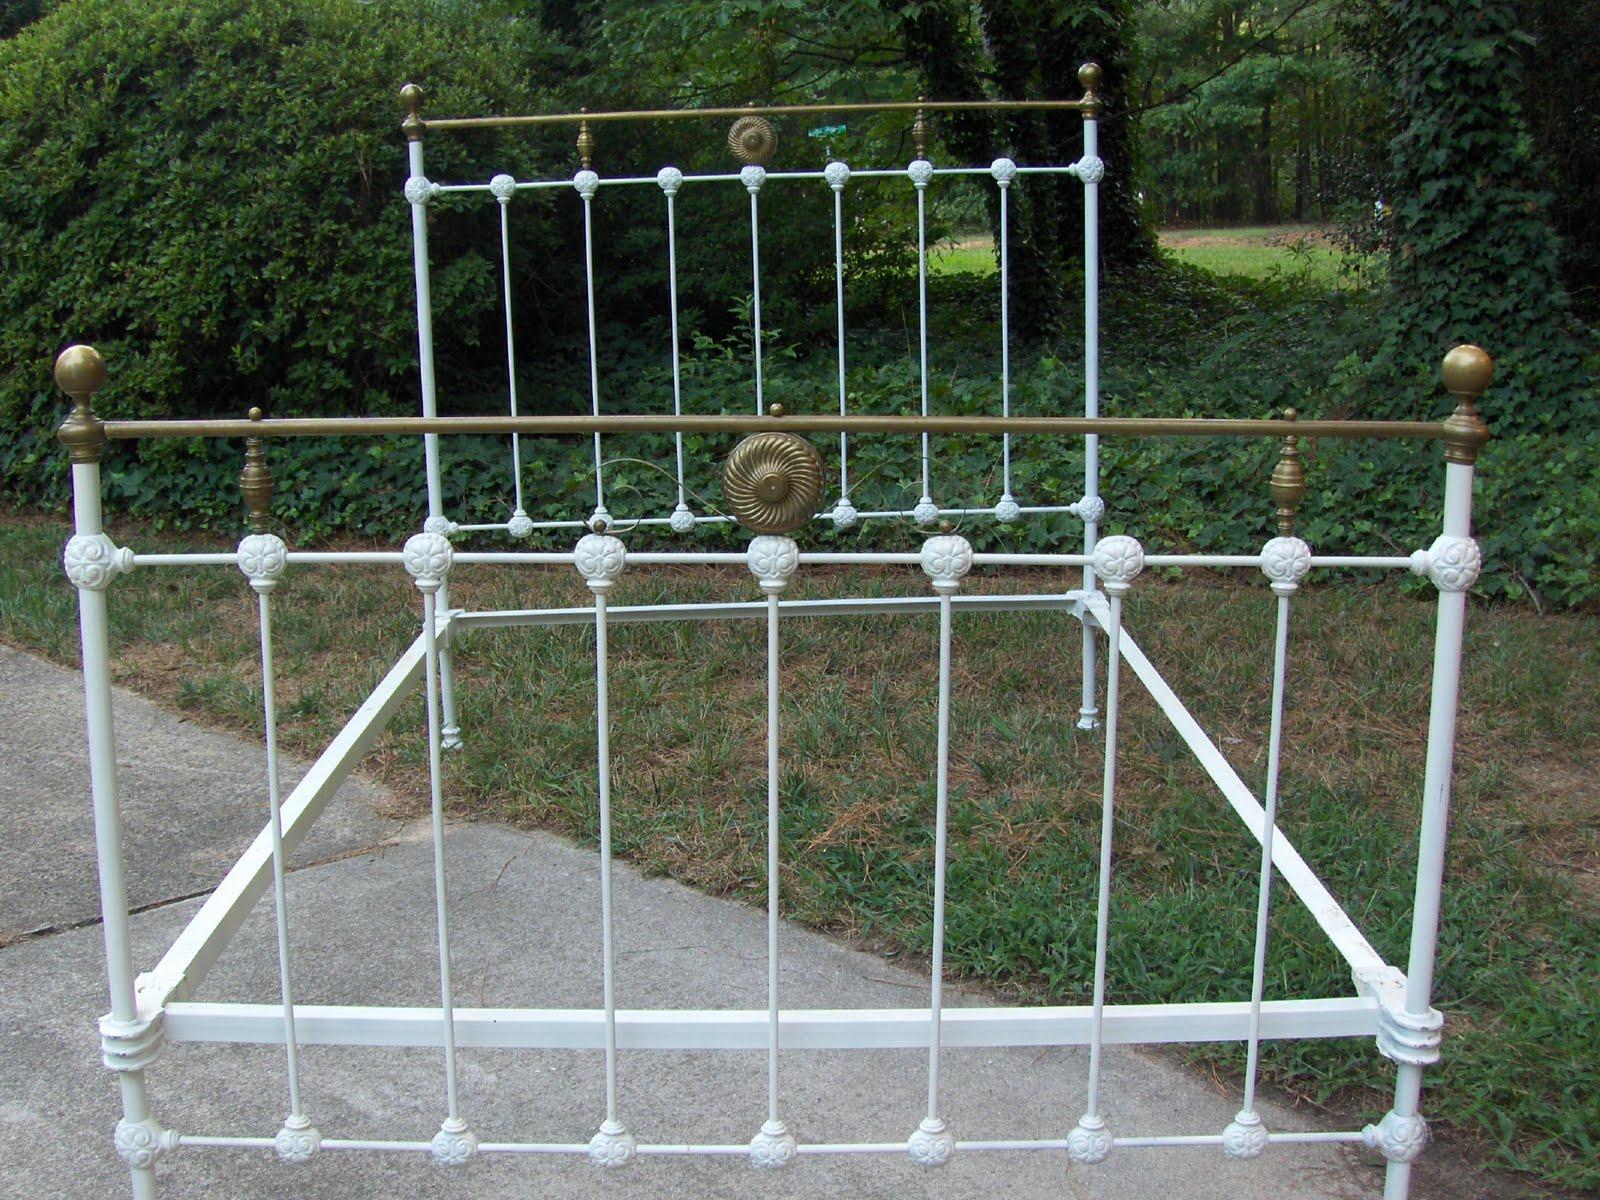 thriftaffair antique brass bed - Antique Iron Bed Frame